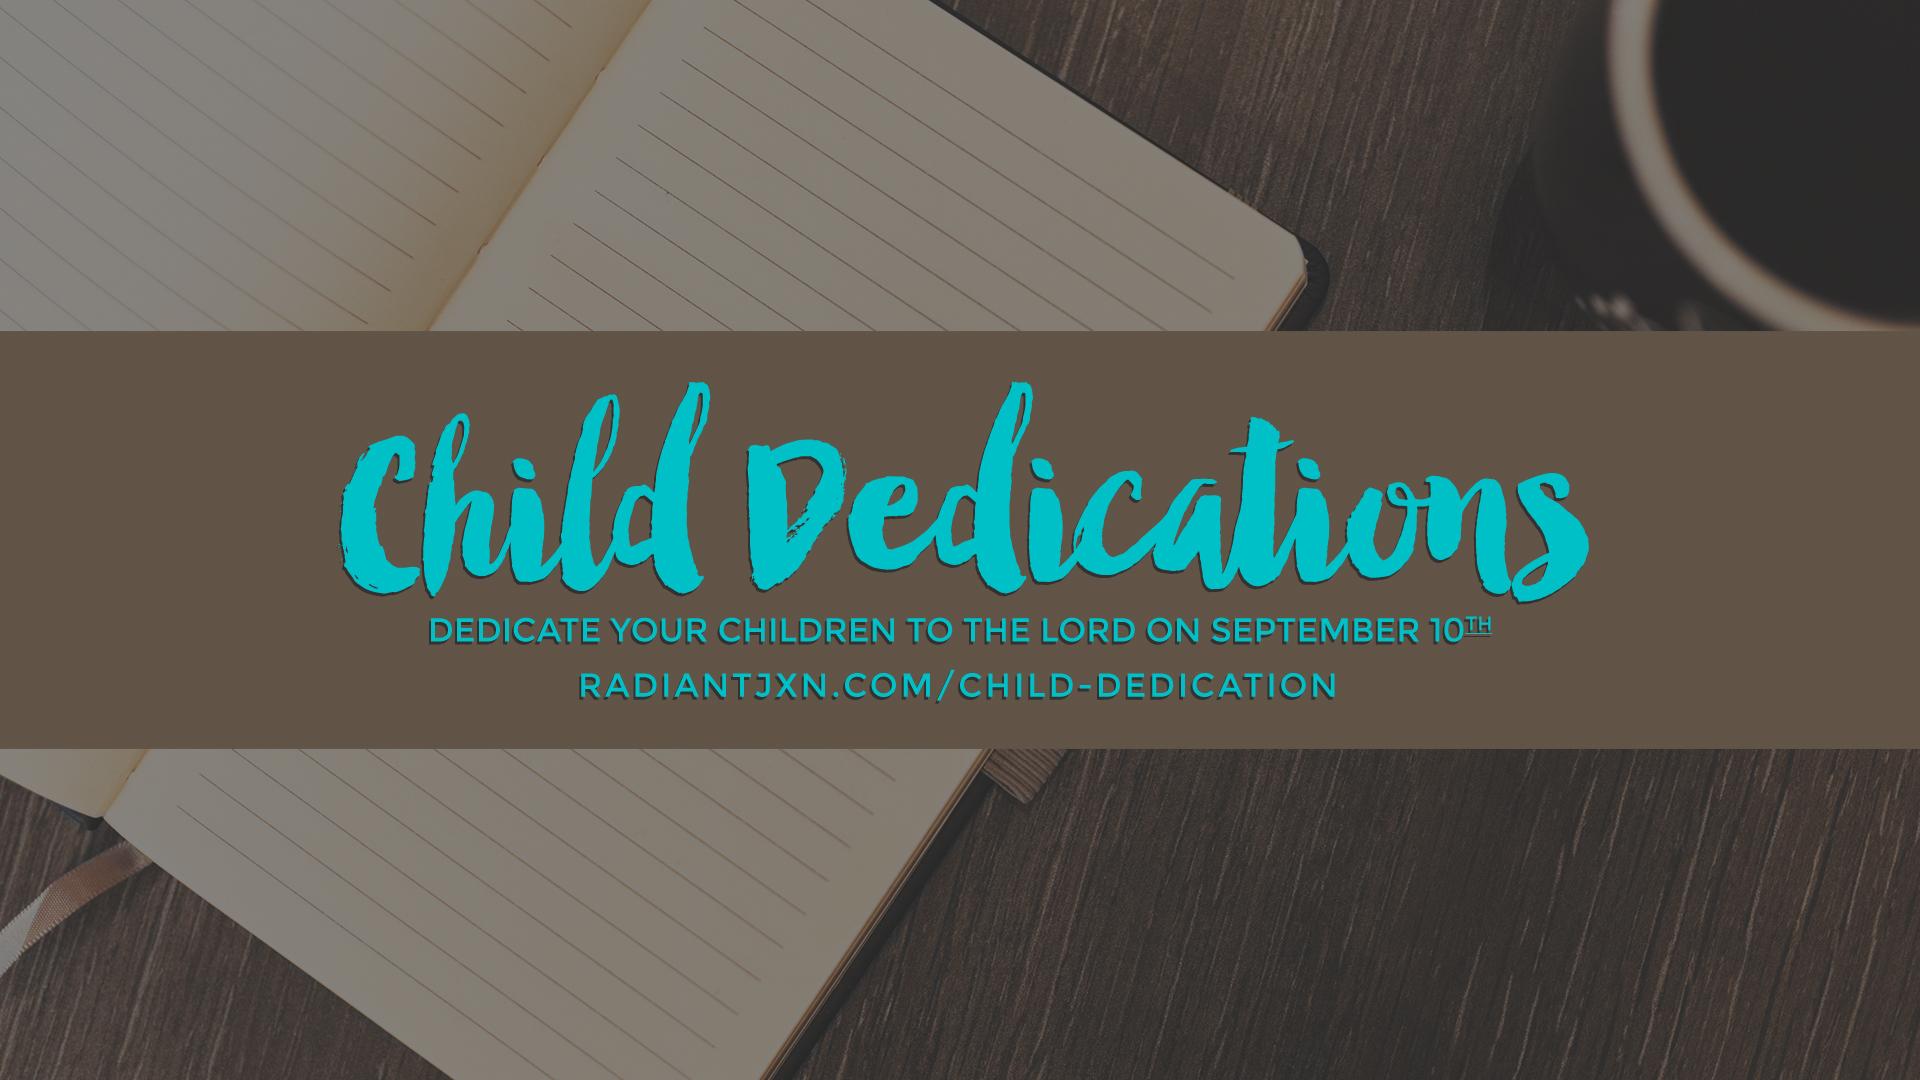 Child dedications september 10th